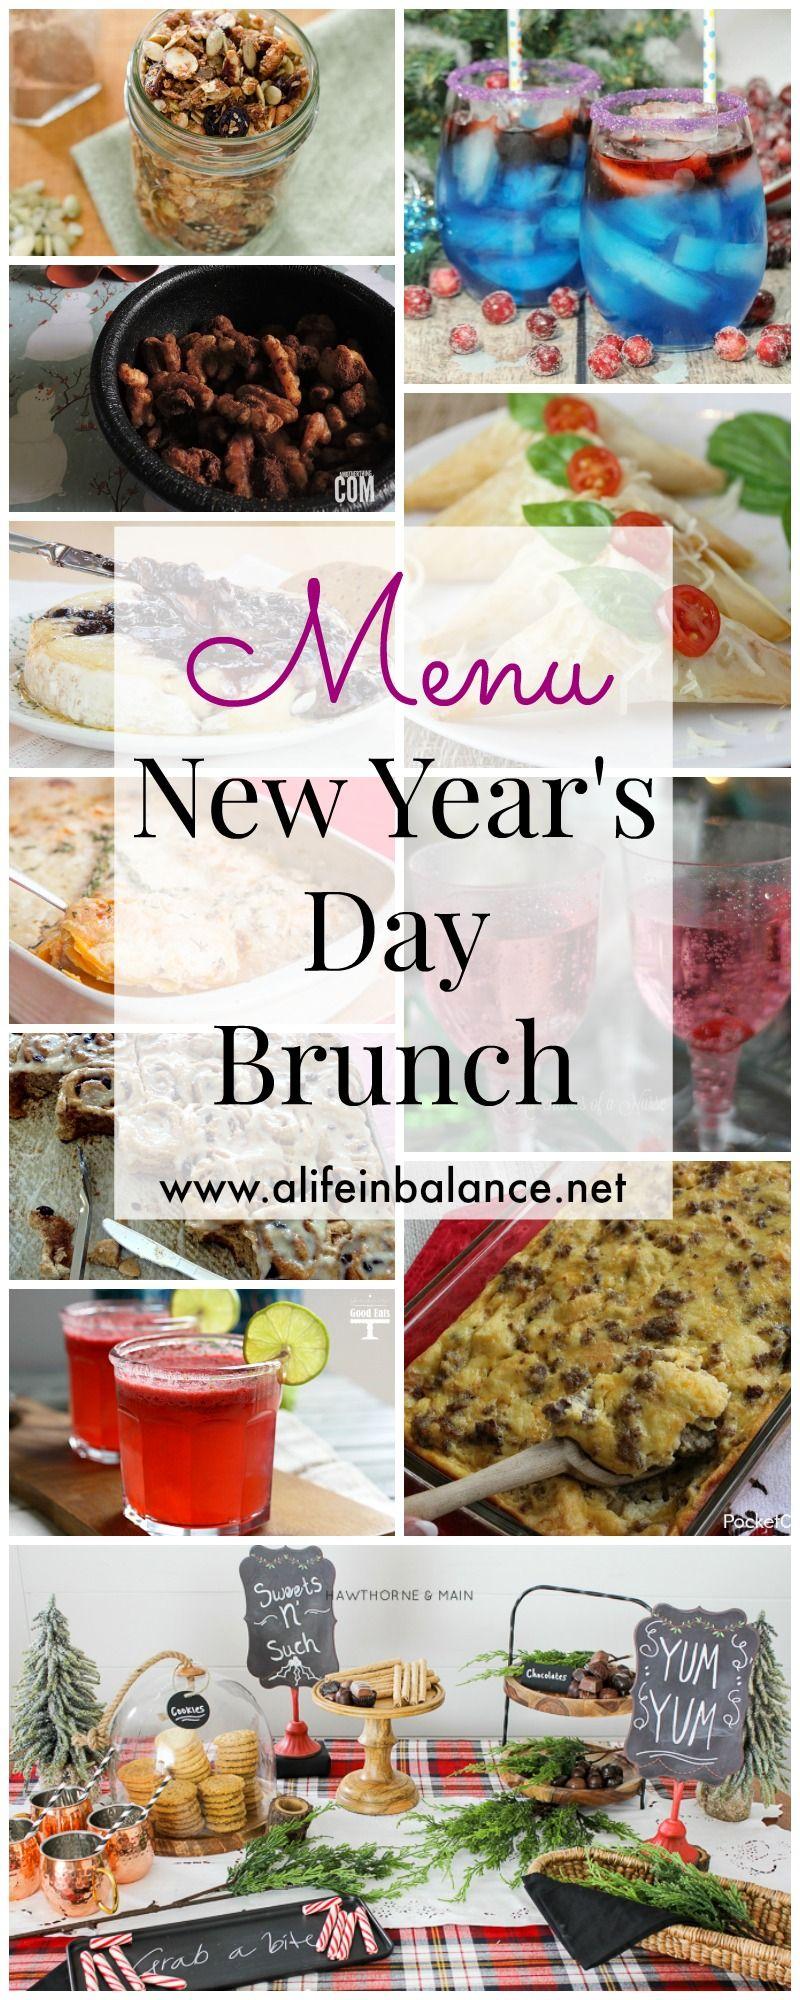 Menu: New Year's Day Brunch | Brunch, New years day brunch ...